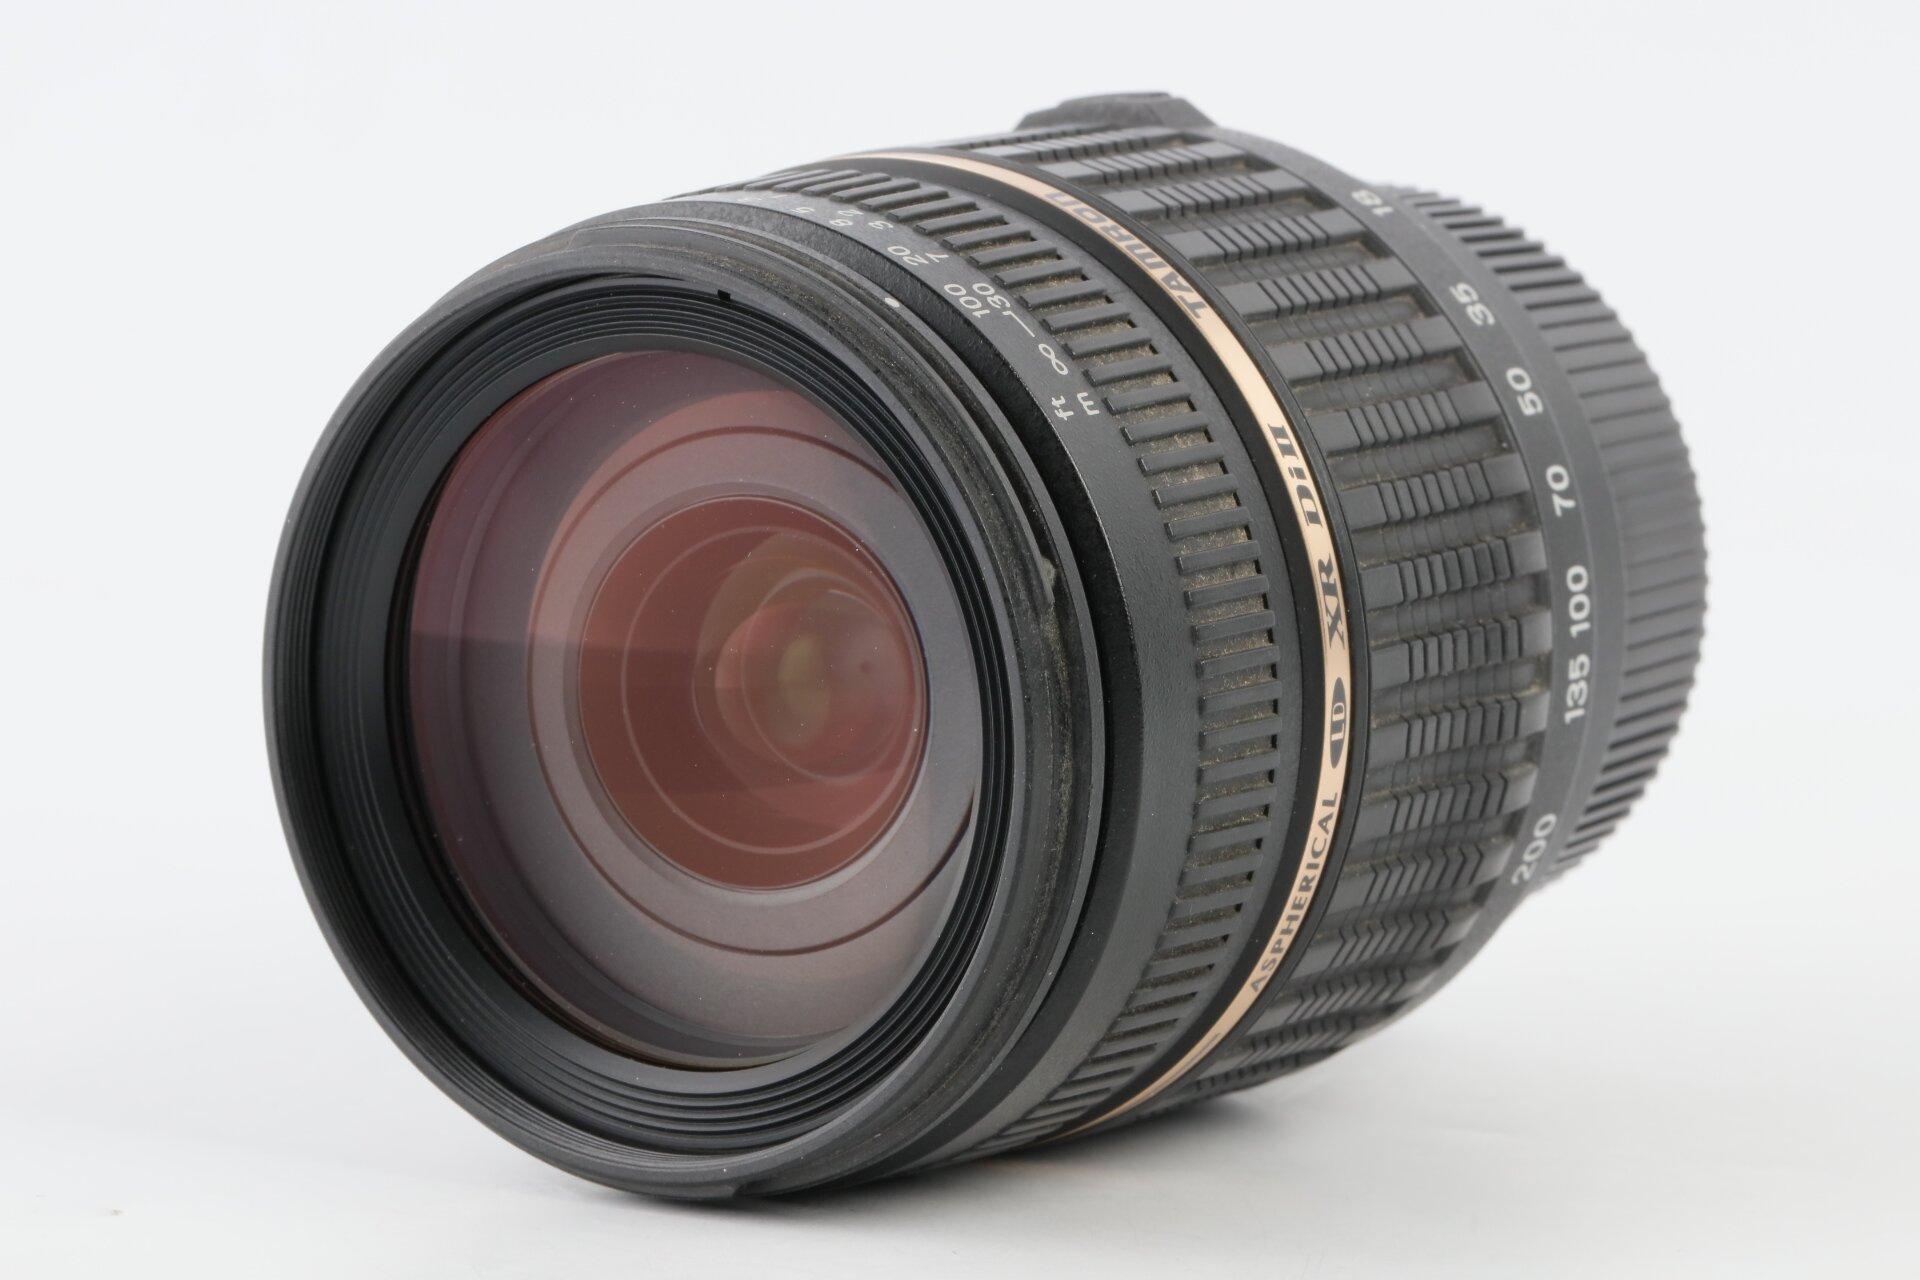 Tamron AF 18-200mm 3,5-6,3 IF Macro Aspherical LD XR Di II Pentax K